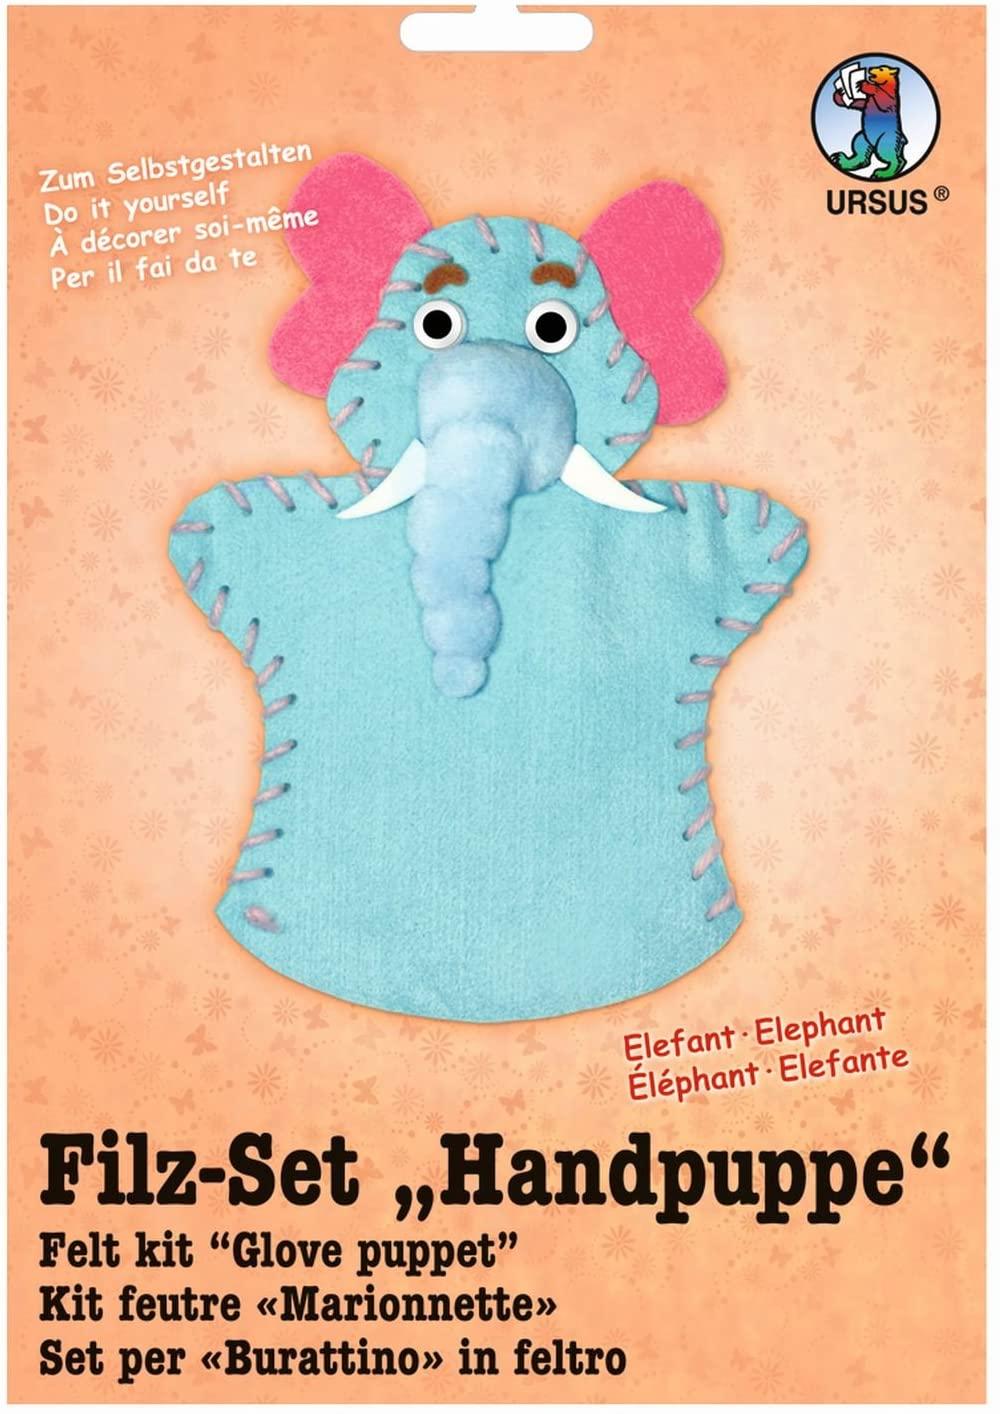 Ursus Glove Puppet Felt kit